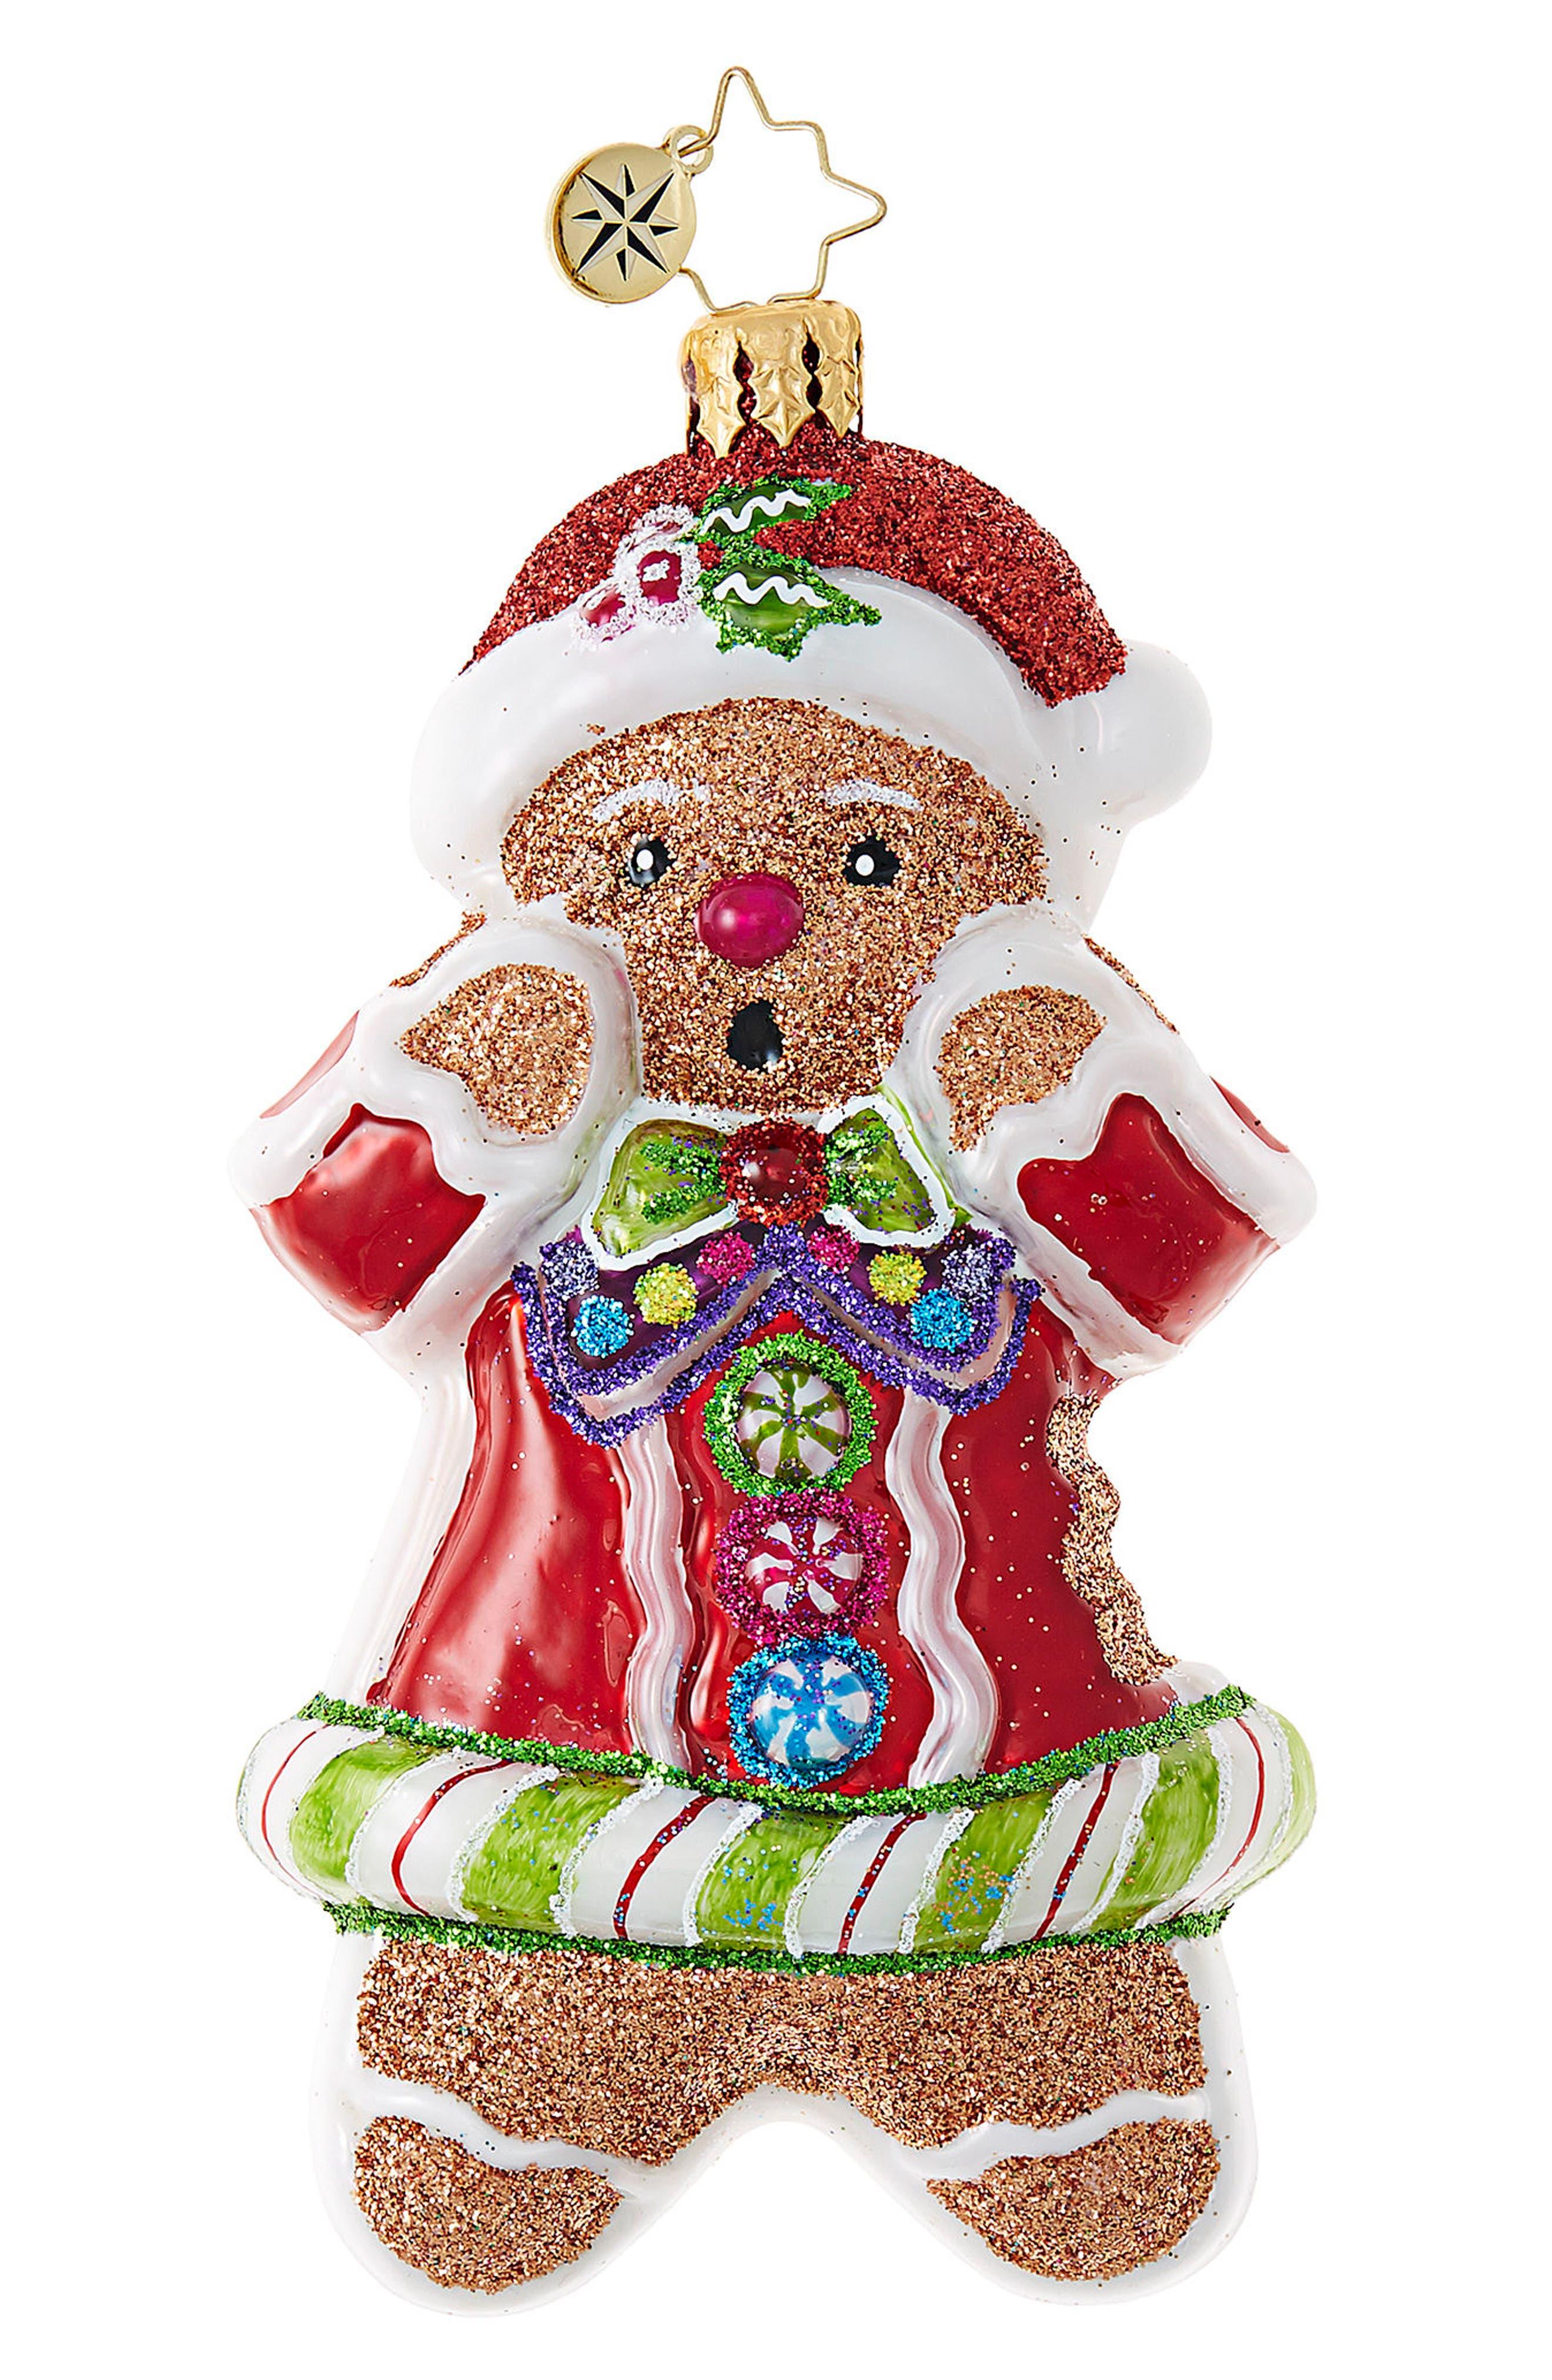 Main Image - Christopher Radko Just One Bite Gingerbread Man Santa Claus Ornament